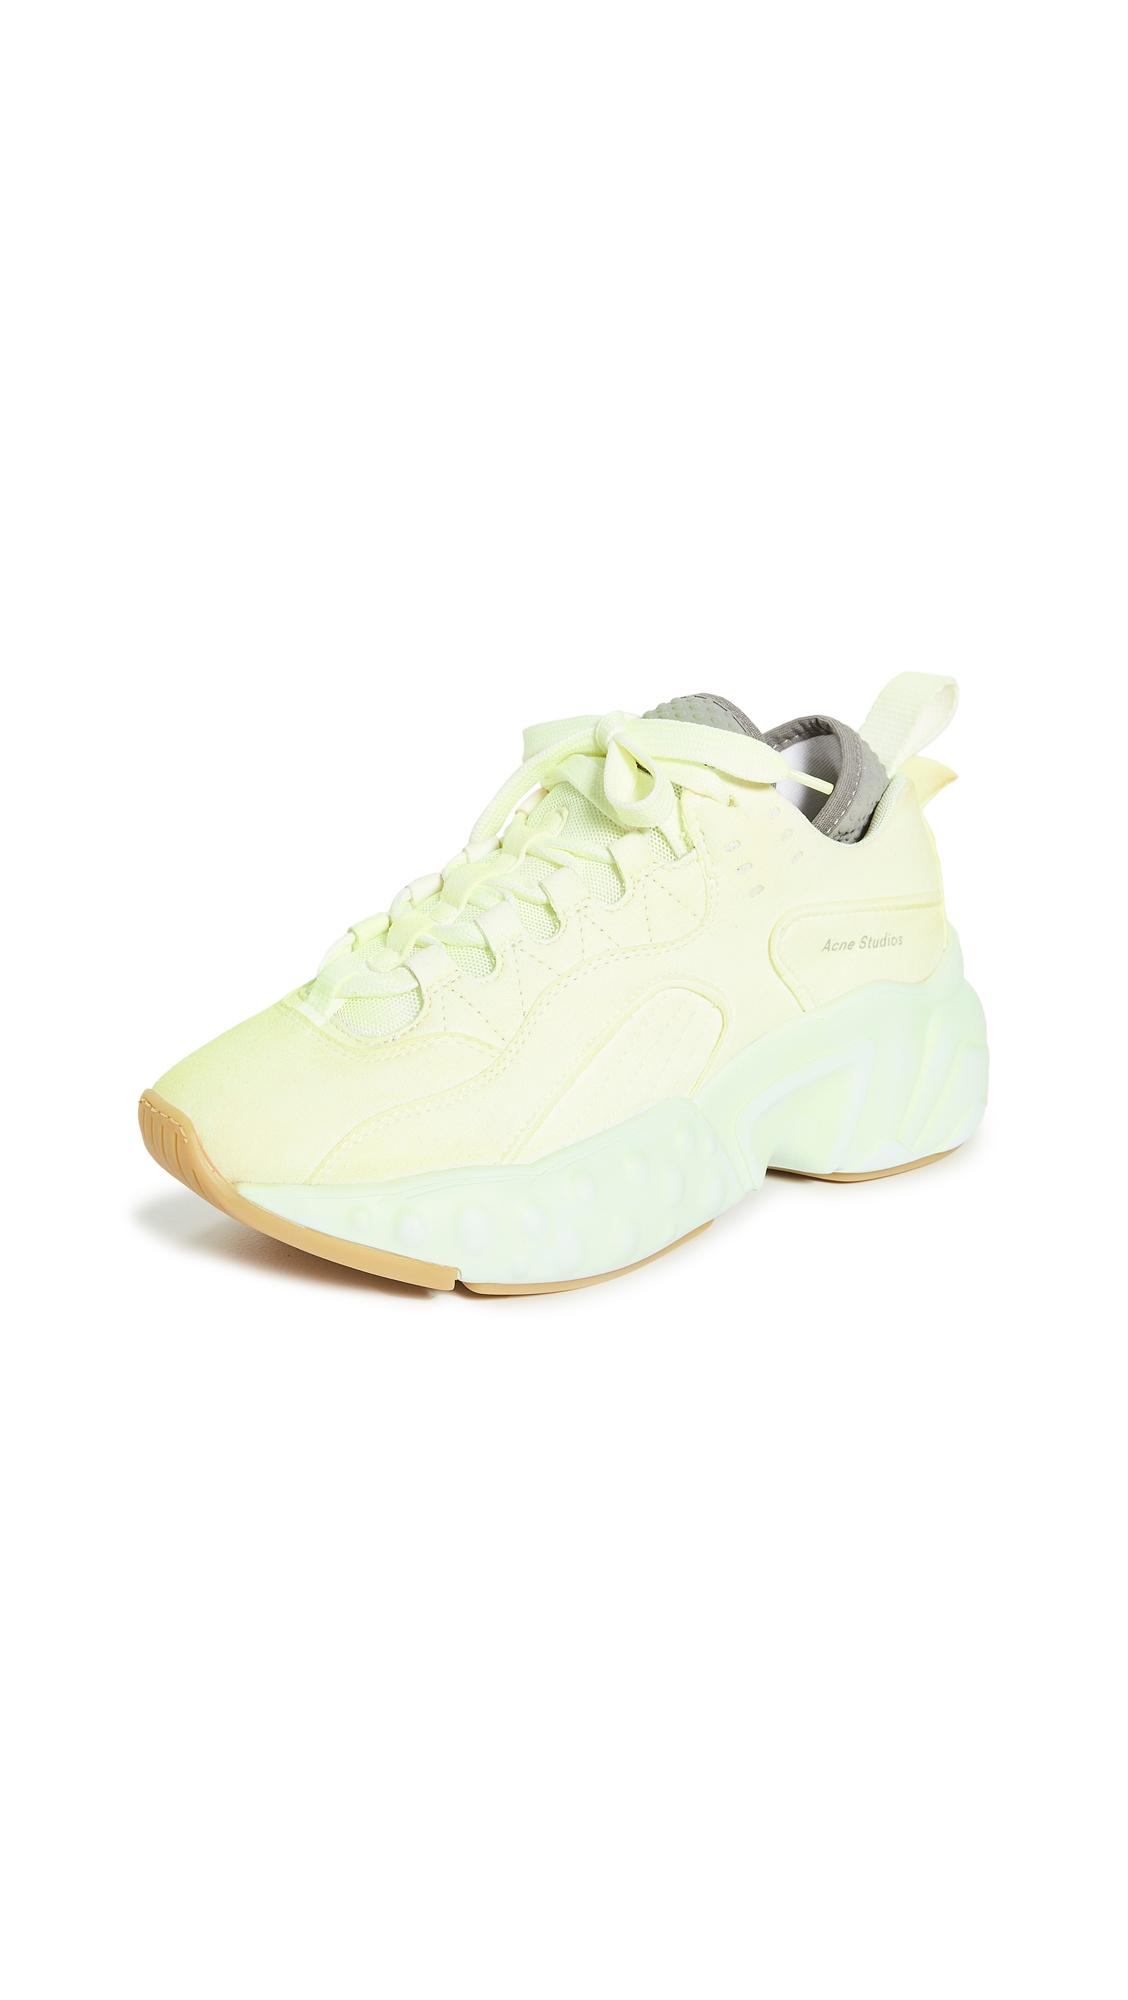 Buy Acne Studios Manhattan Overdyed Sneakers online, shop Acne Studios